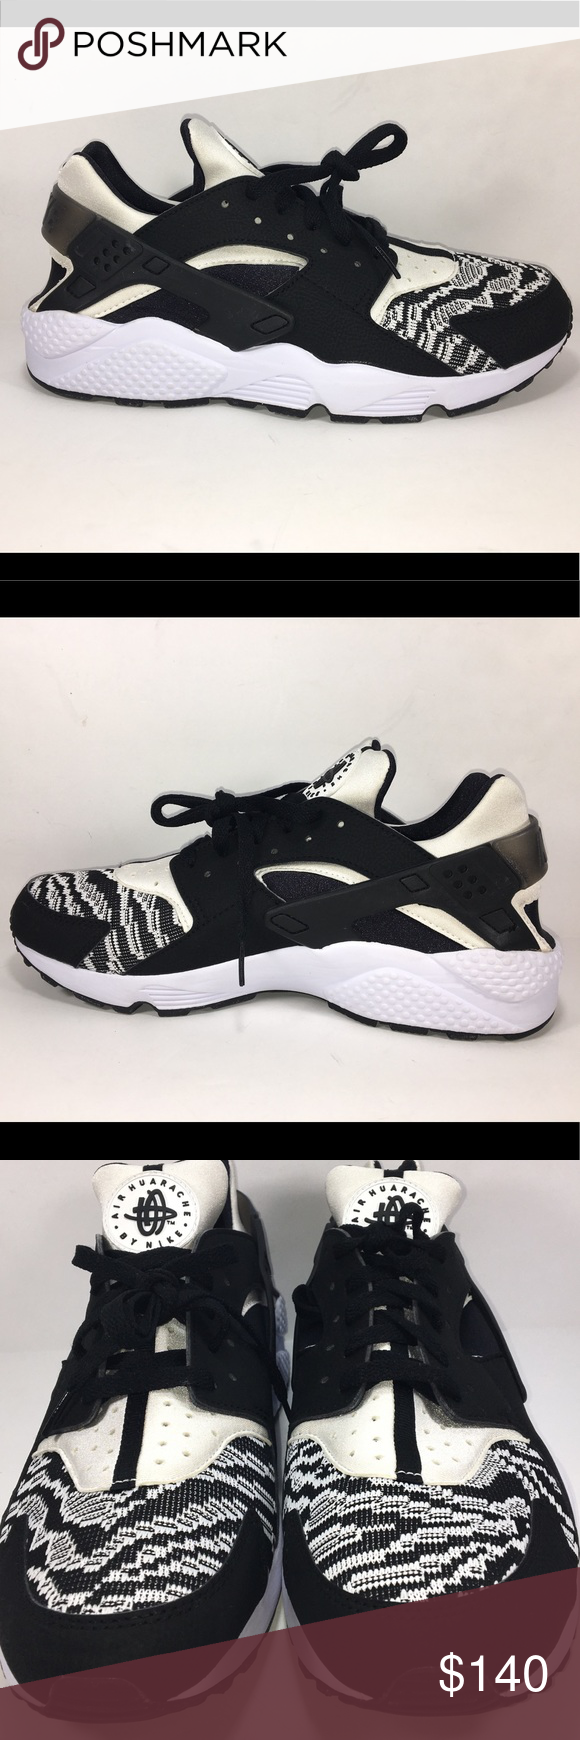 Nike Air Huarache Run PA Shoes Zebra Knit Sneaker Excellent New